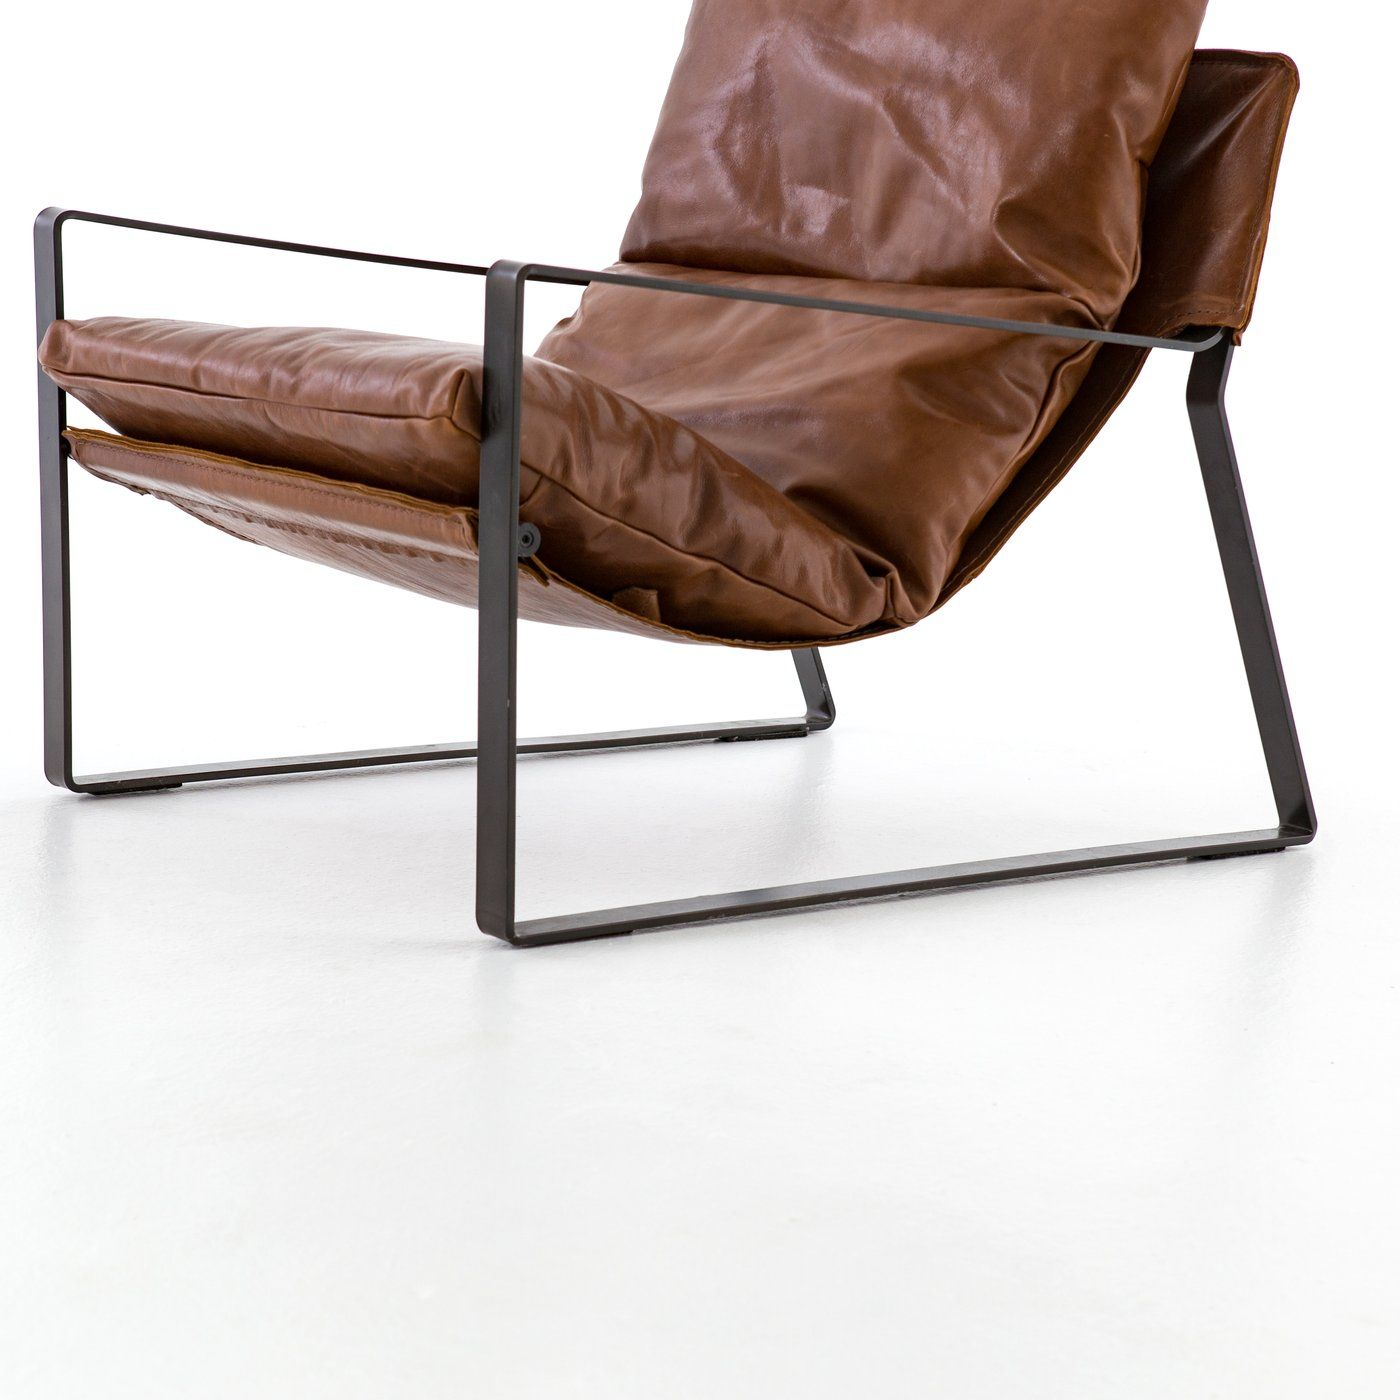 Excellent Emmett Sling Chair Dakota Tobacco In 2019 Lounge Chairs Evergreenethics Interior Chair Design Evergreenethicsorg